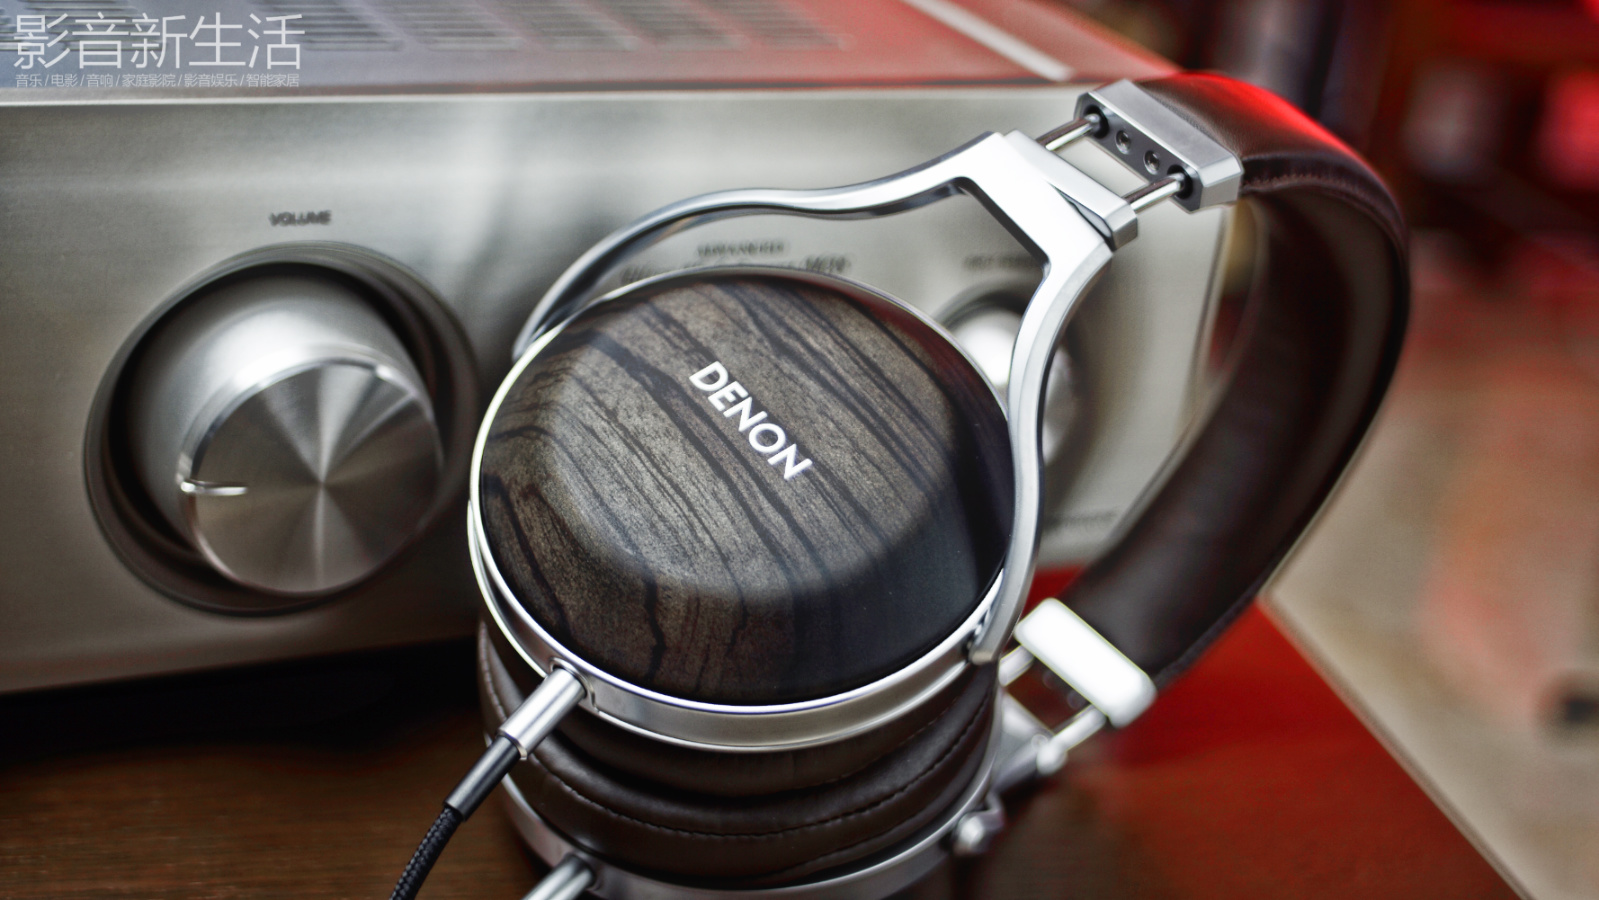 Denon 天龙 D5200 头戴式耳机